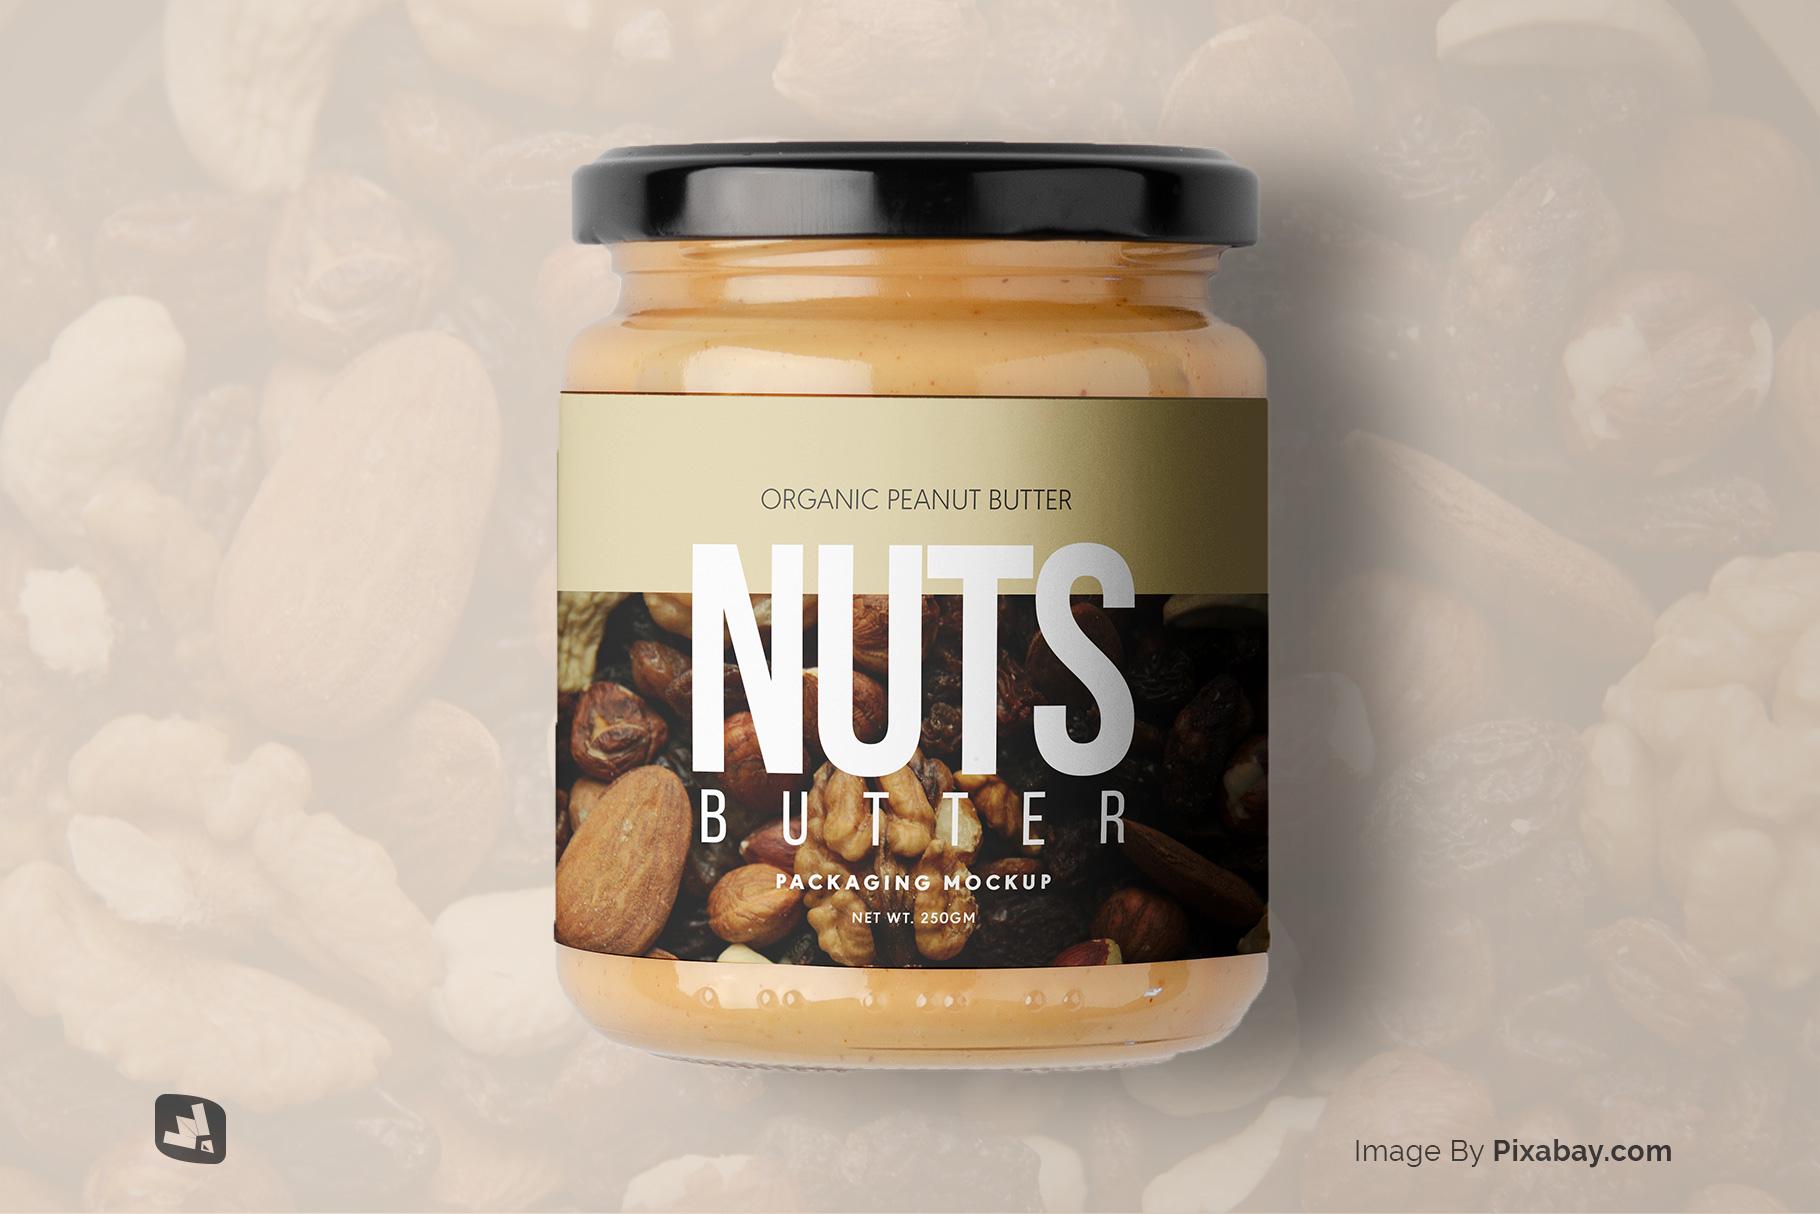 designer's credit of the organic nut butter packaging mockup